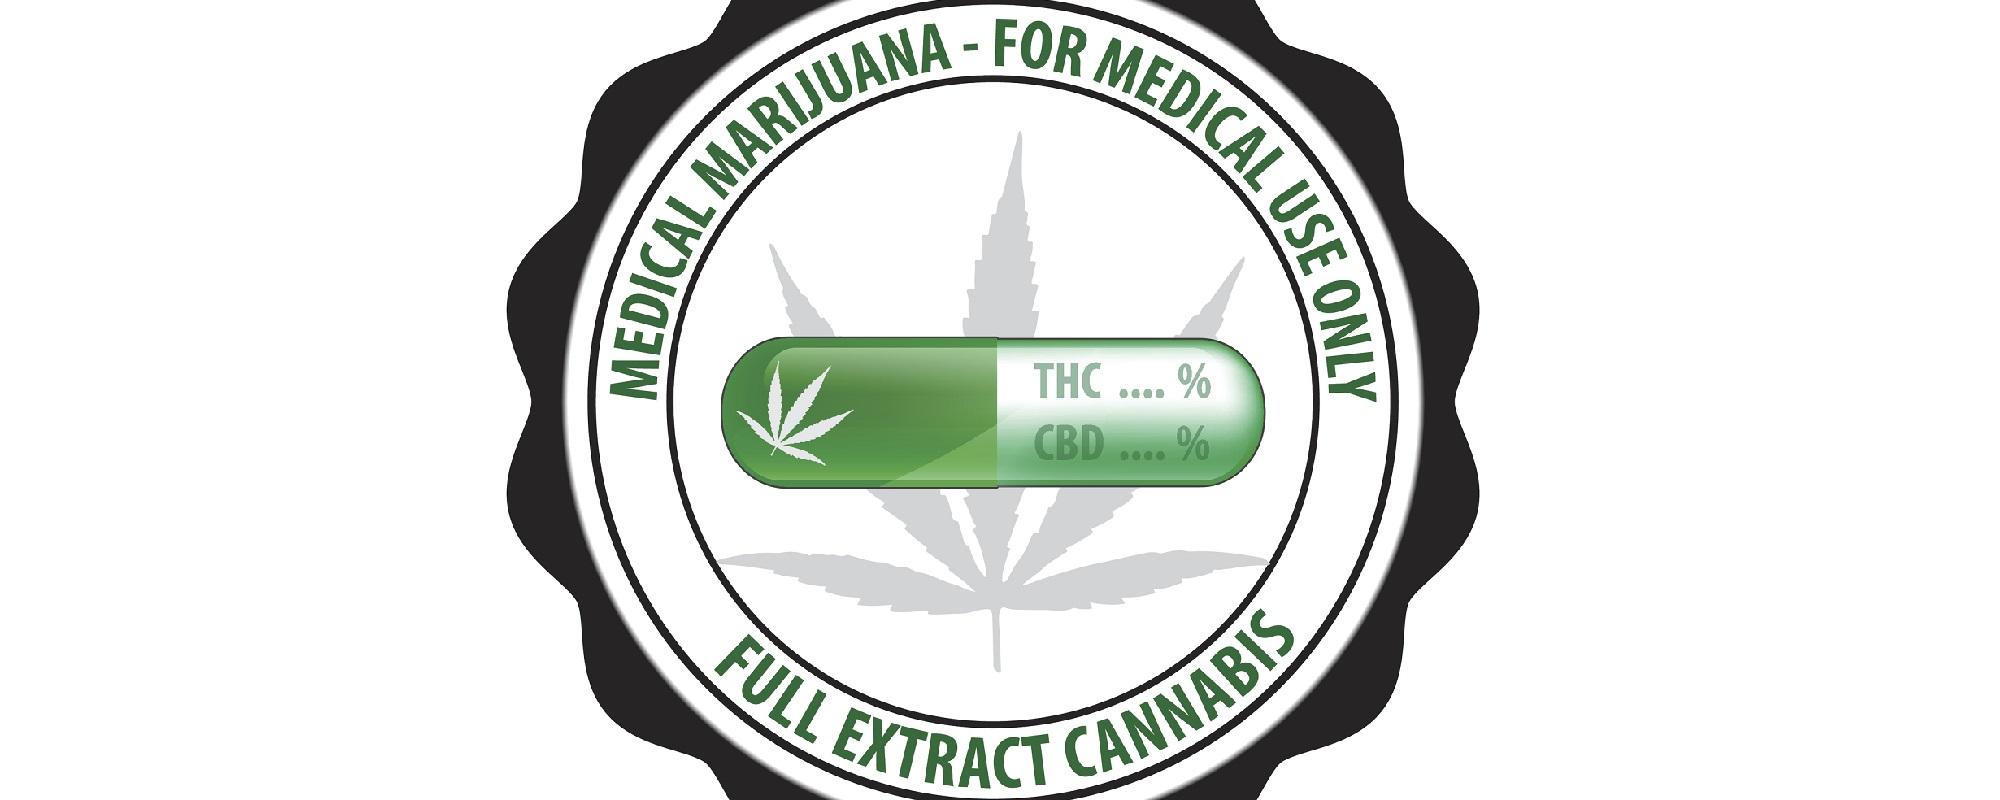 Cannabidiol versus Tetrahydrocannabinol: CBD vs THC